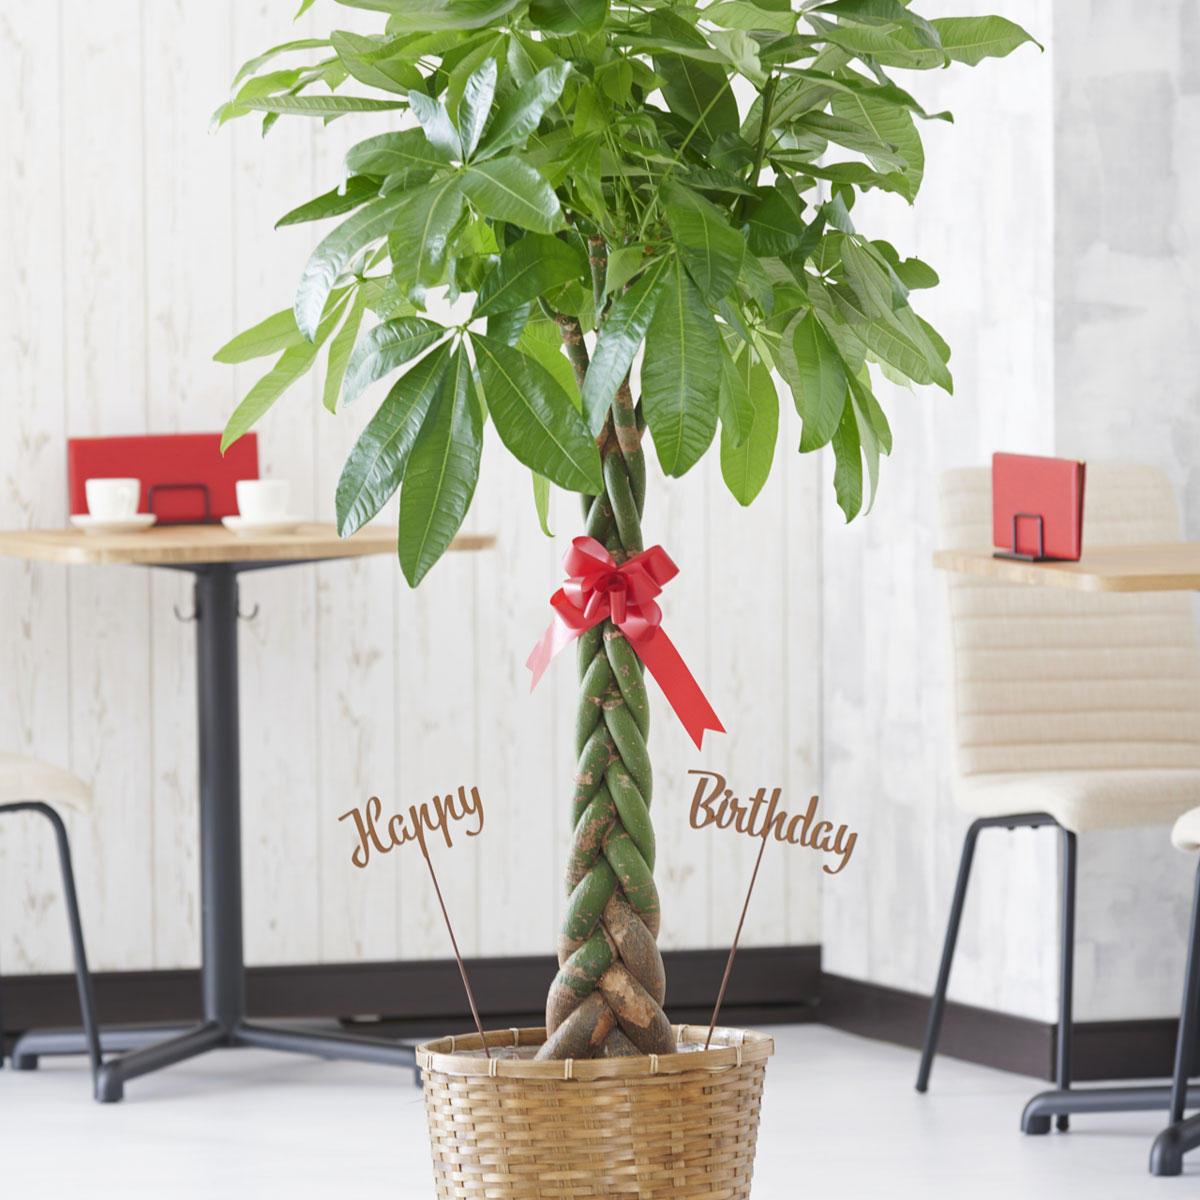 <p>観葉植物に3D立体メッセージ札[Happy Birthday(文字型)]を付けたイメージ</p>